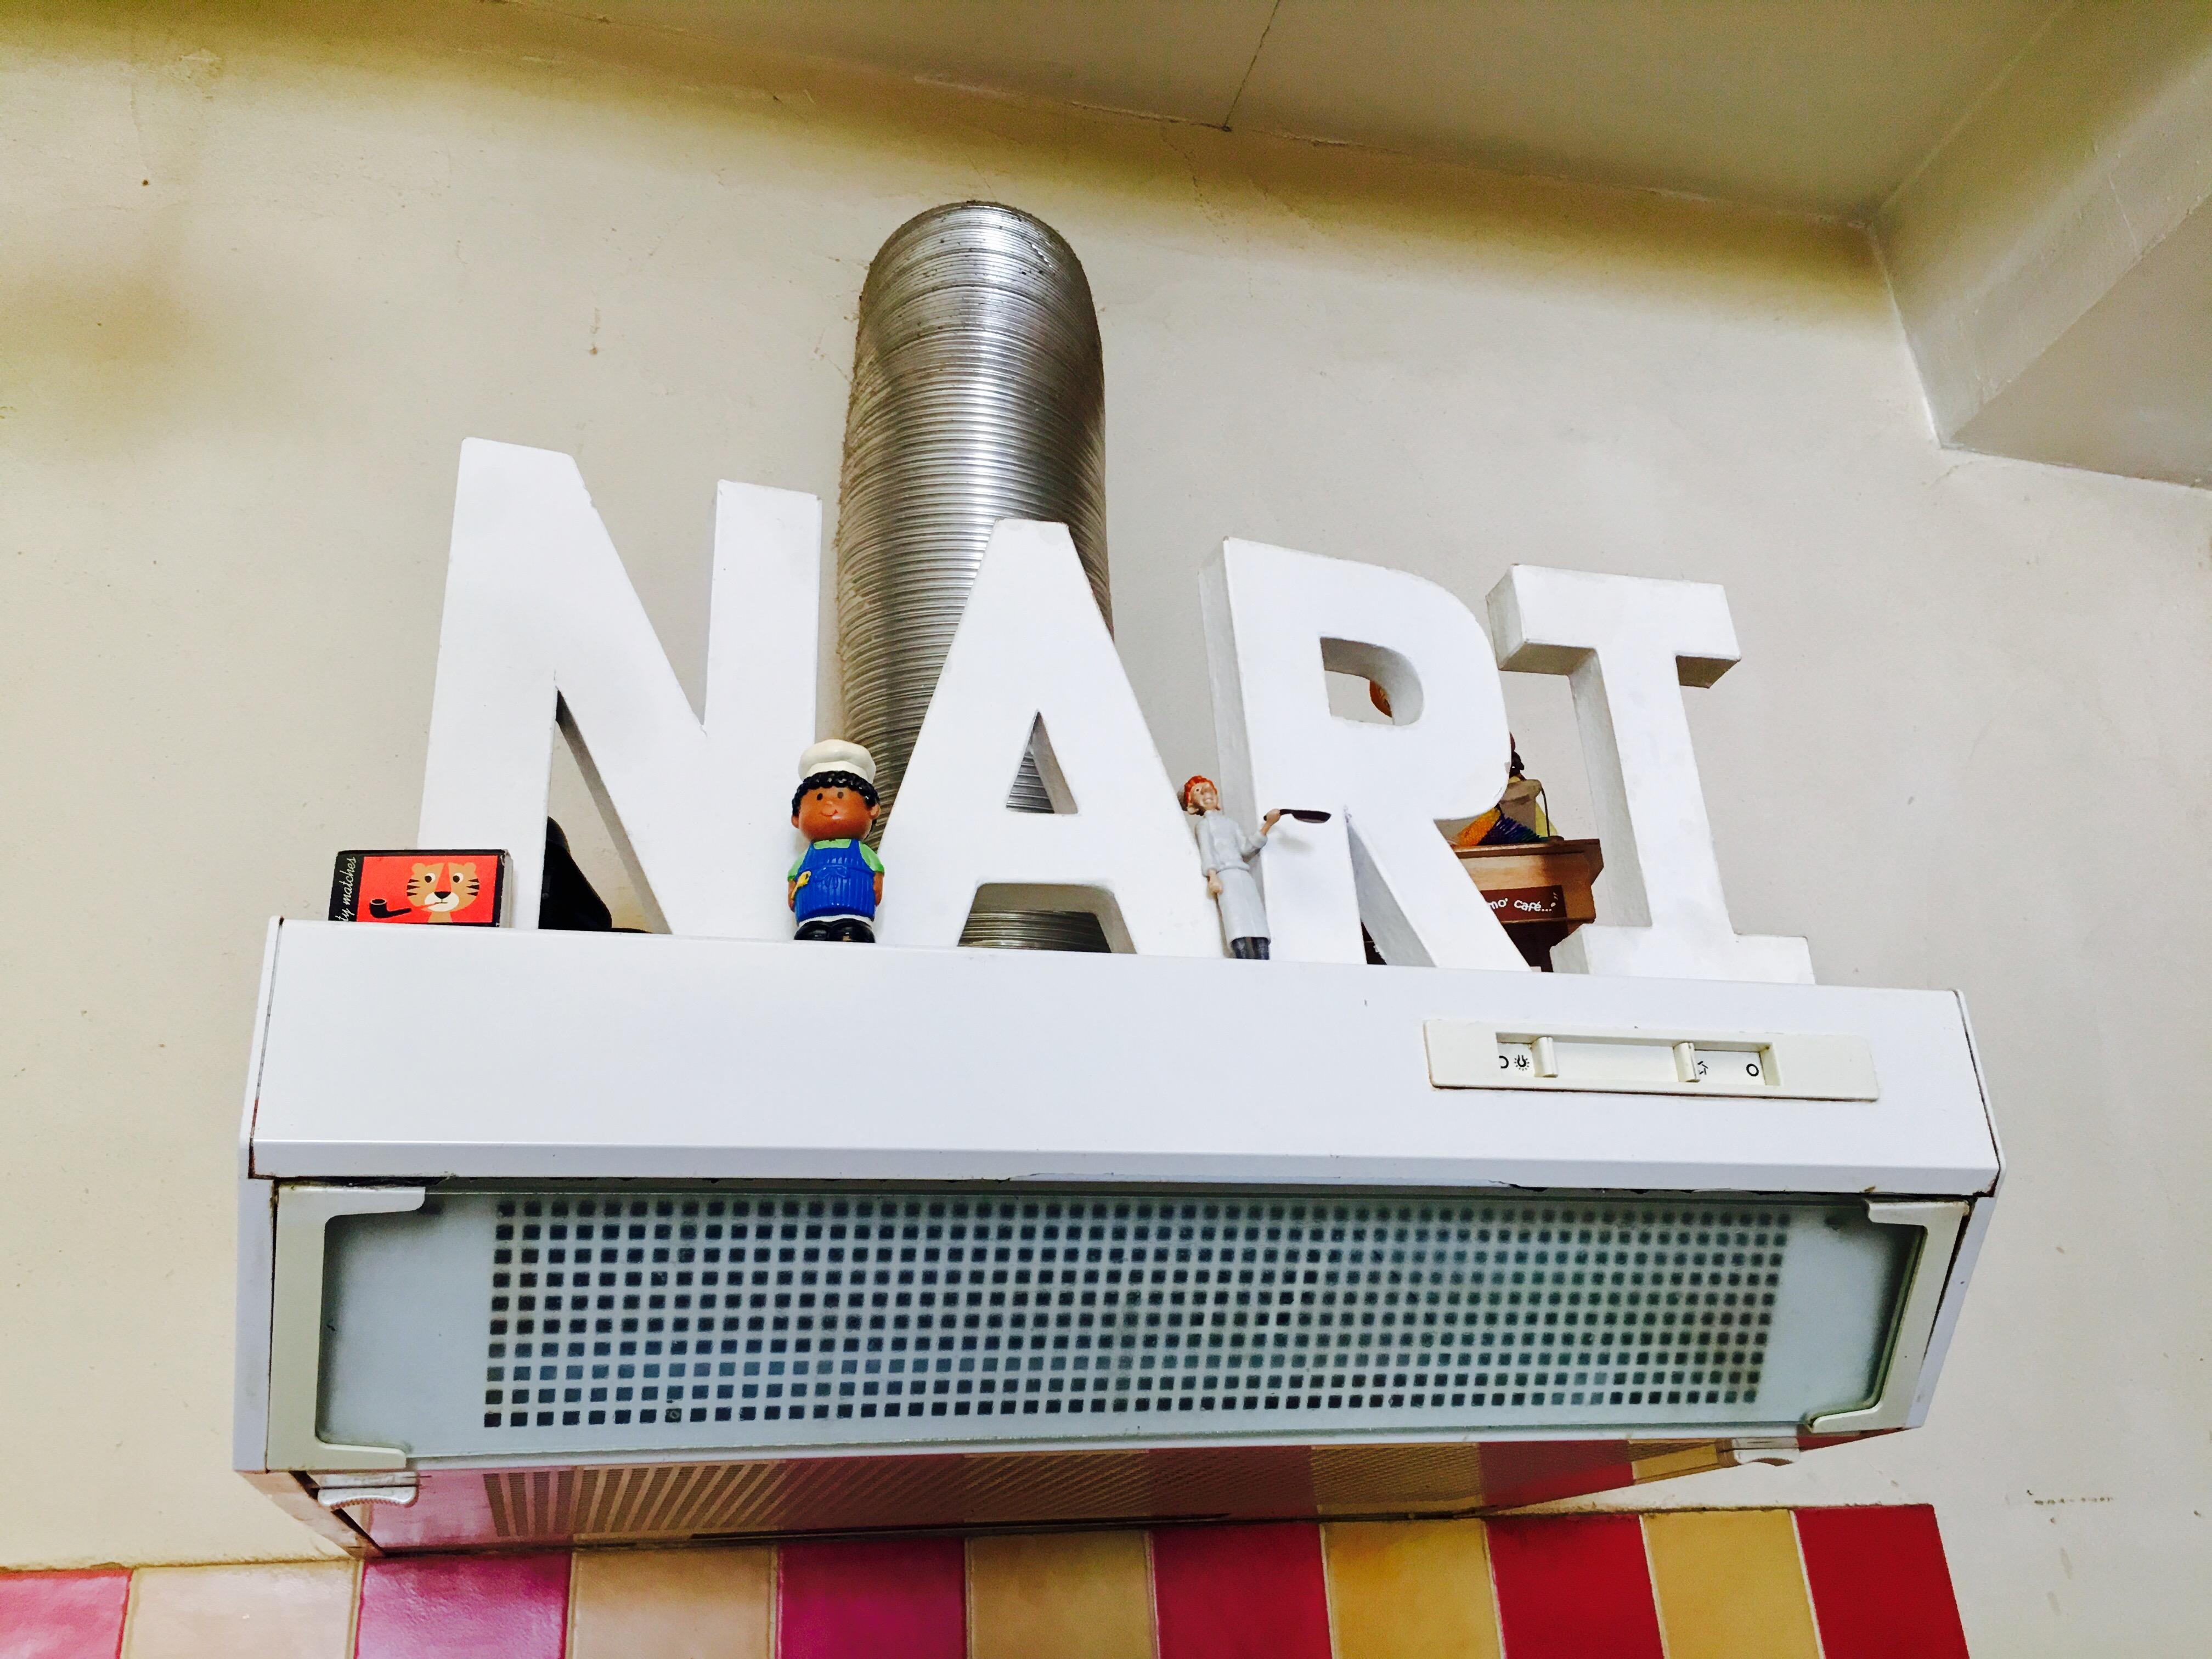 chef Nari Montreuil